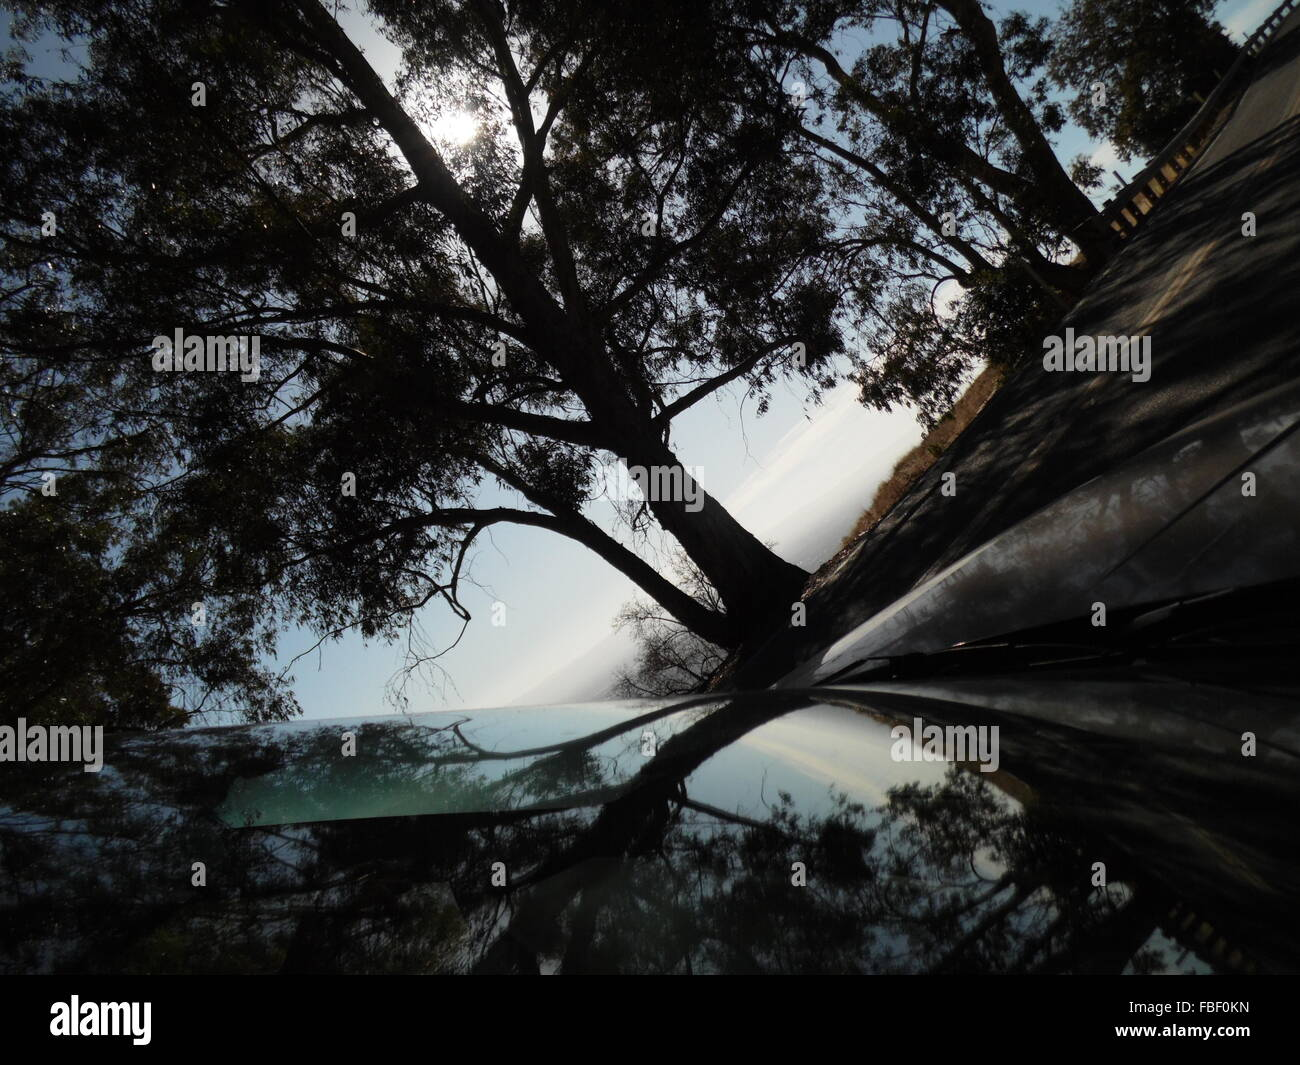 Silhouette Bäume Reflexion über Windschutzscheibe Stockbild